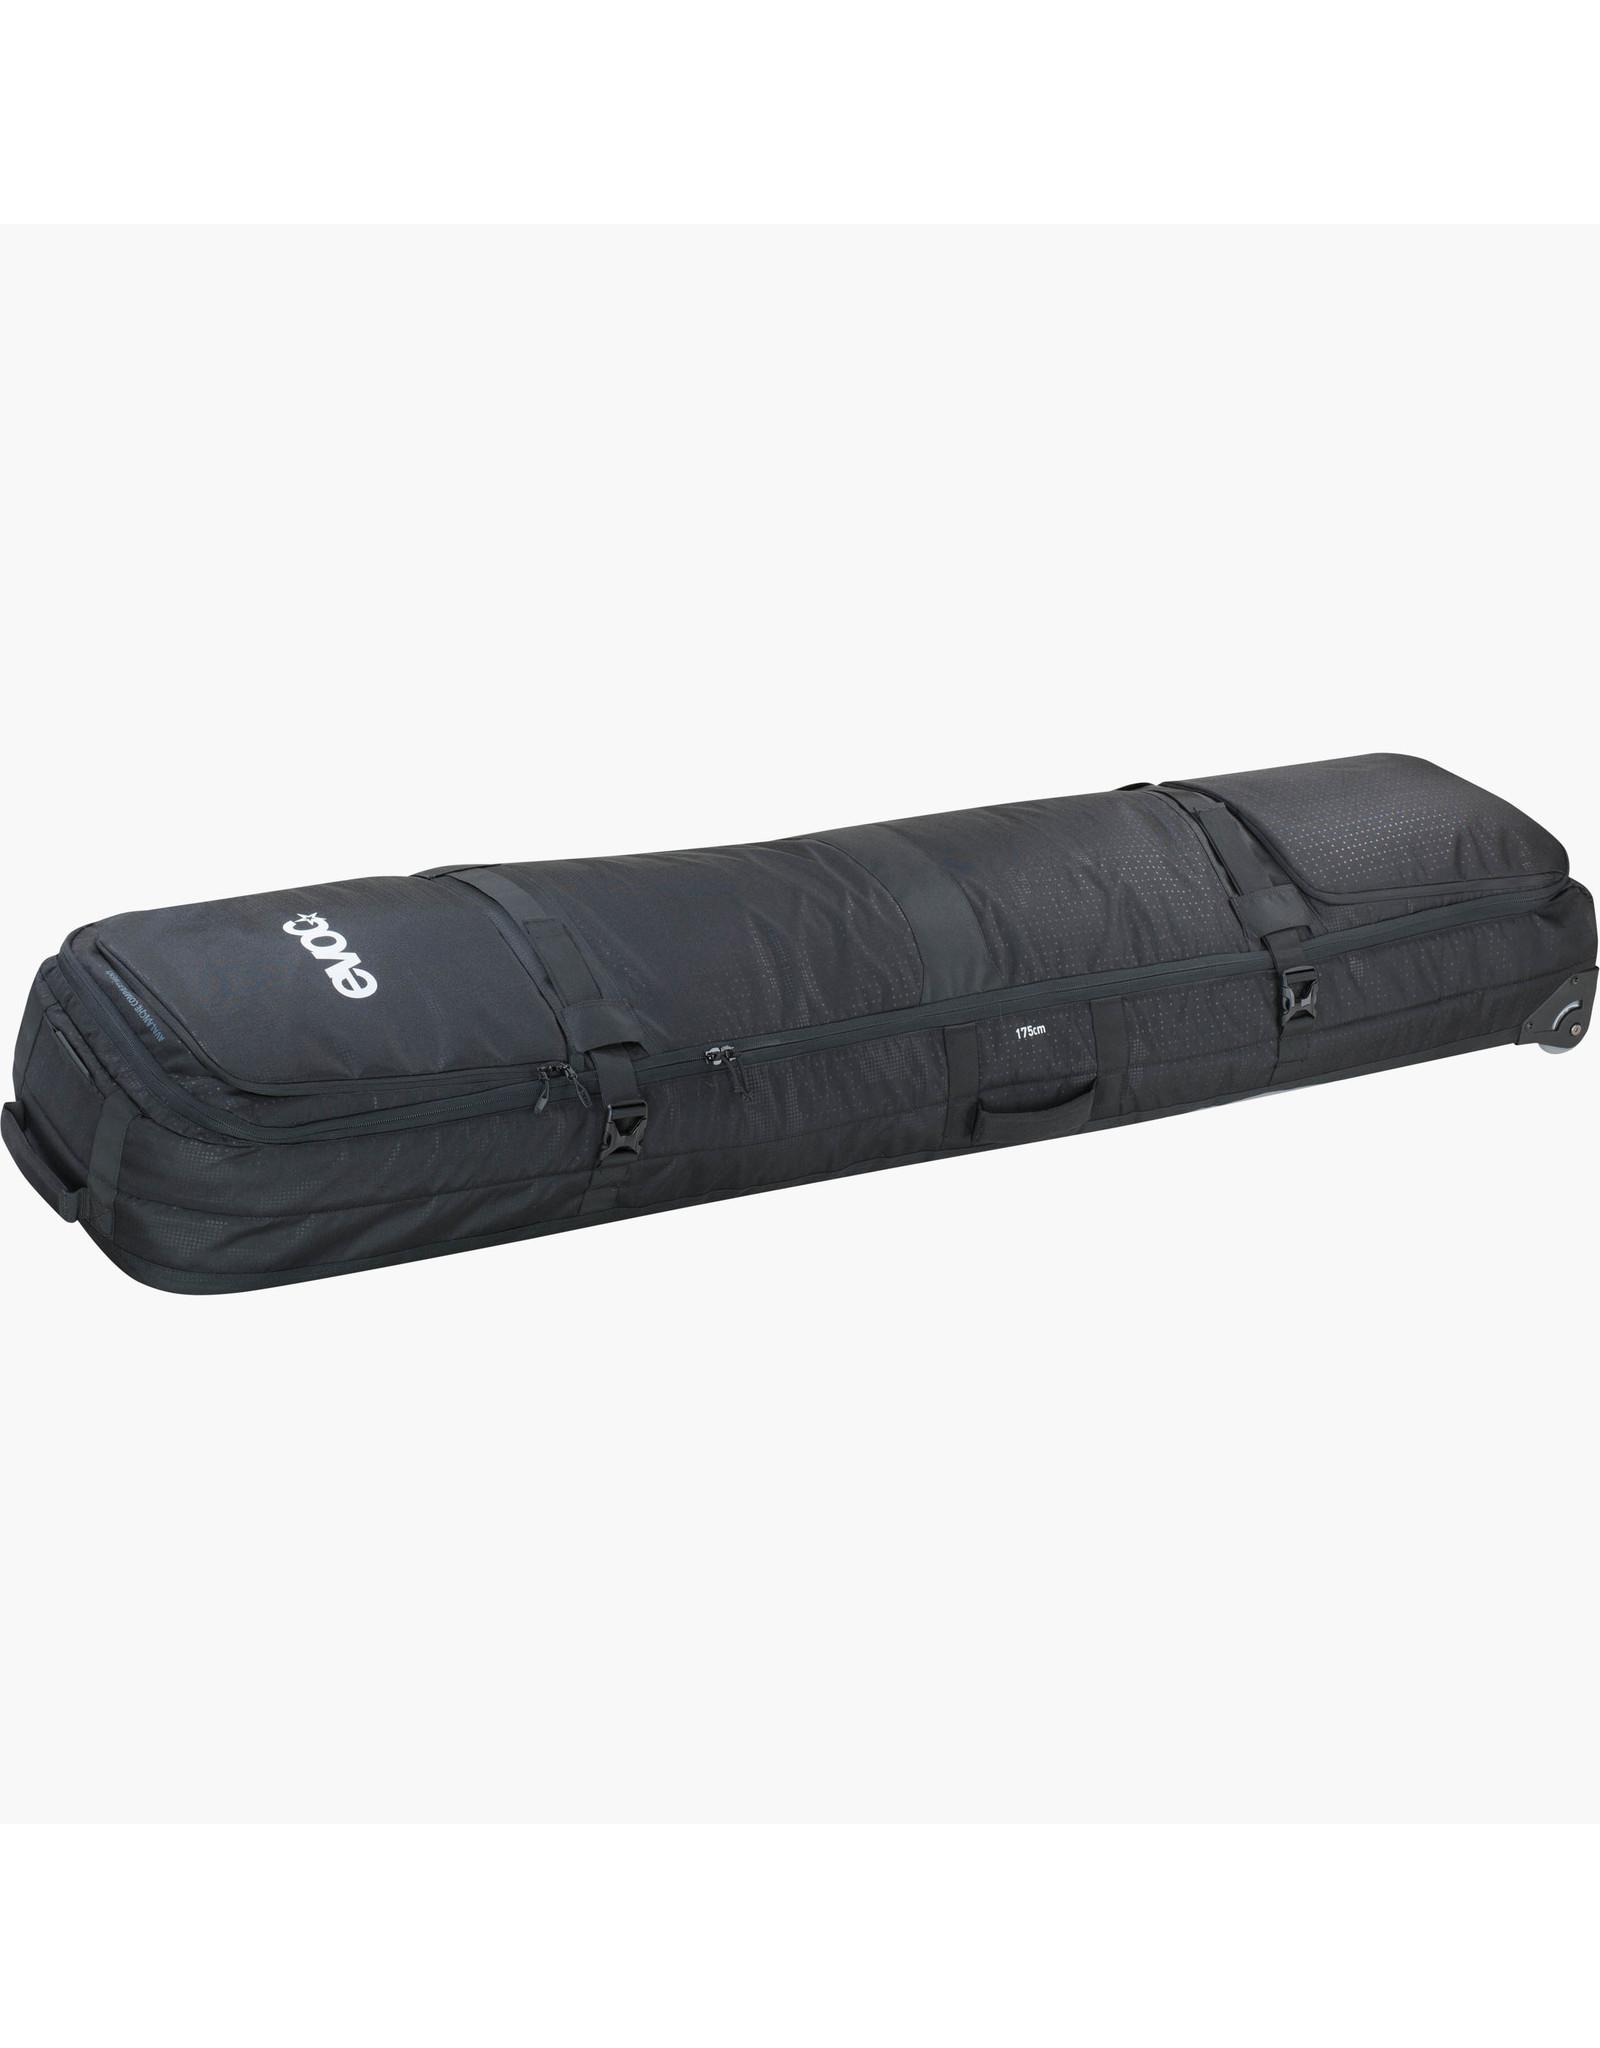 EVOC EVOC, Ski roller, Ski transport bag with wheels, Black, XL